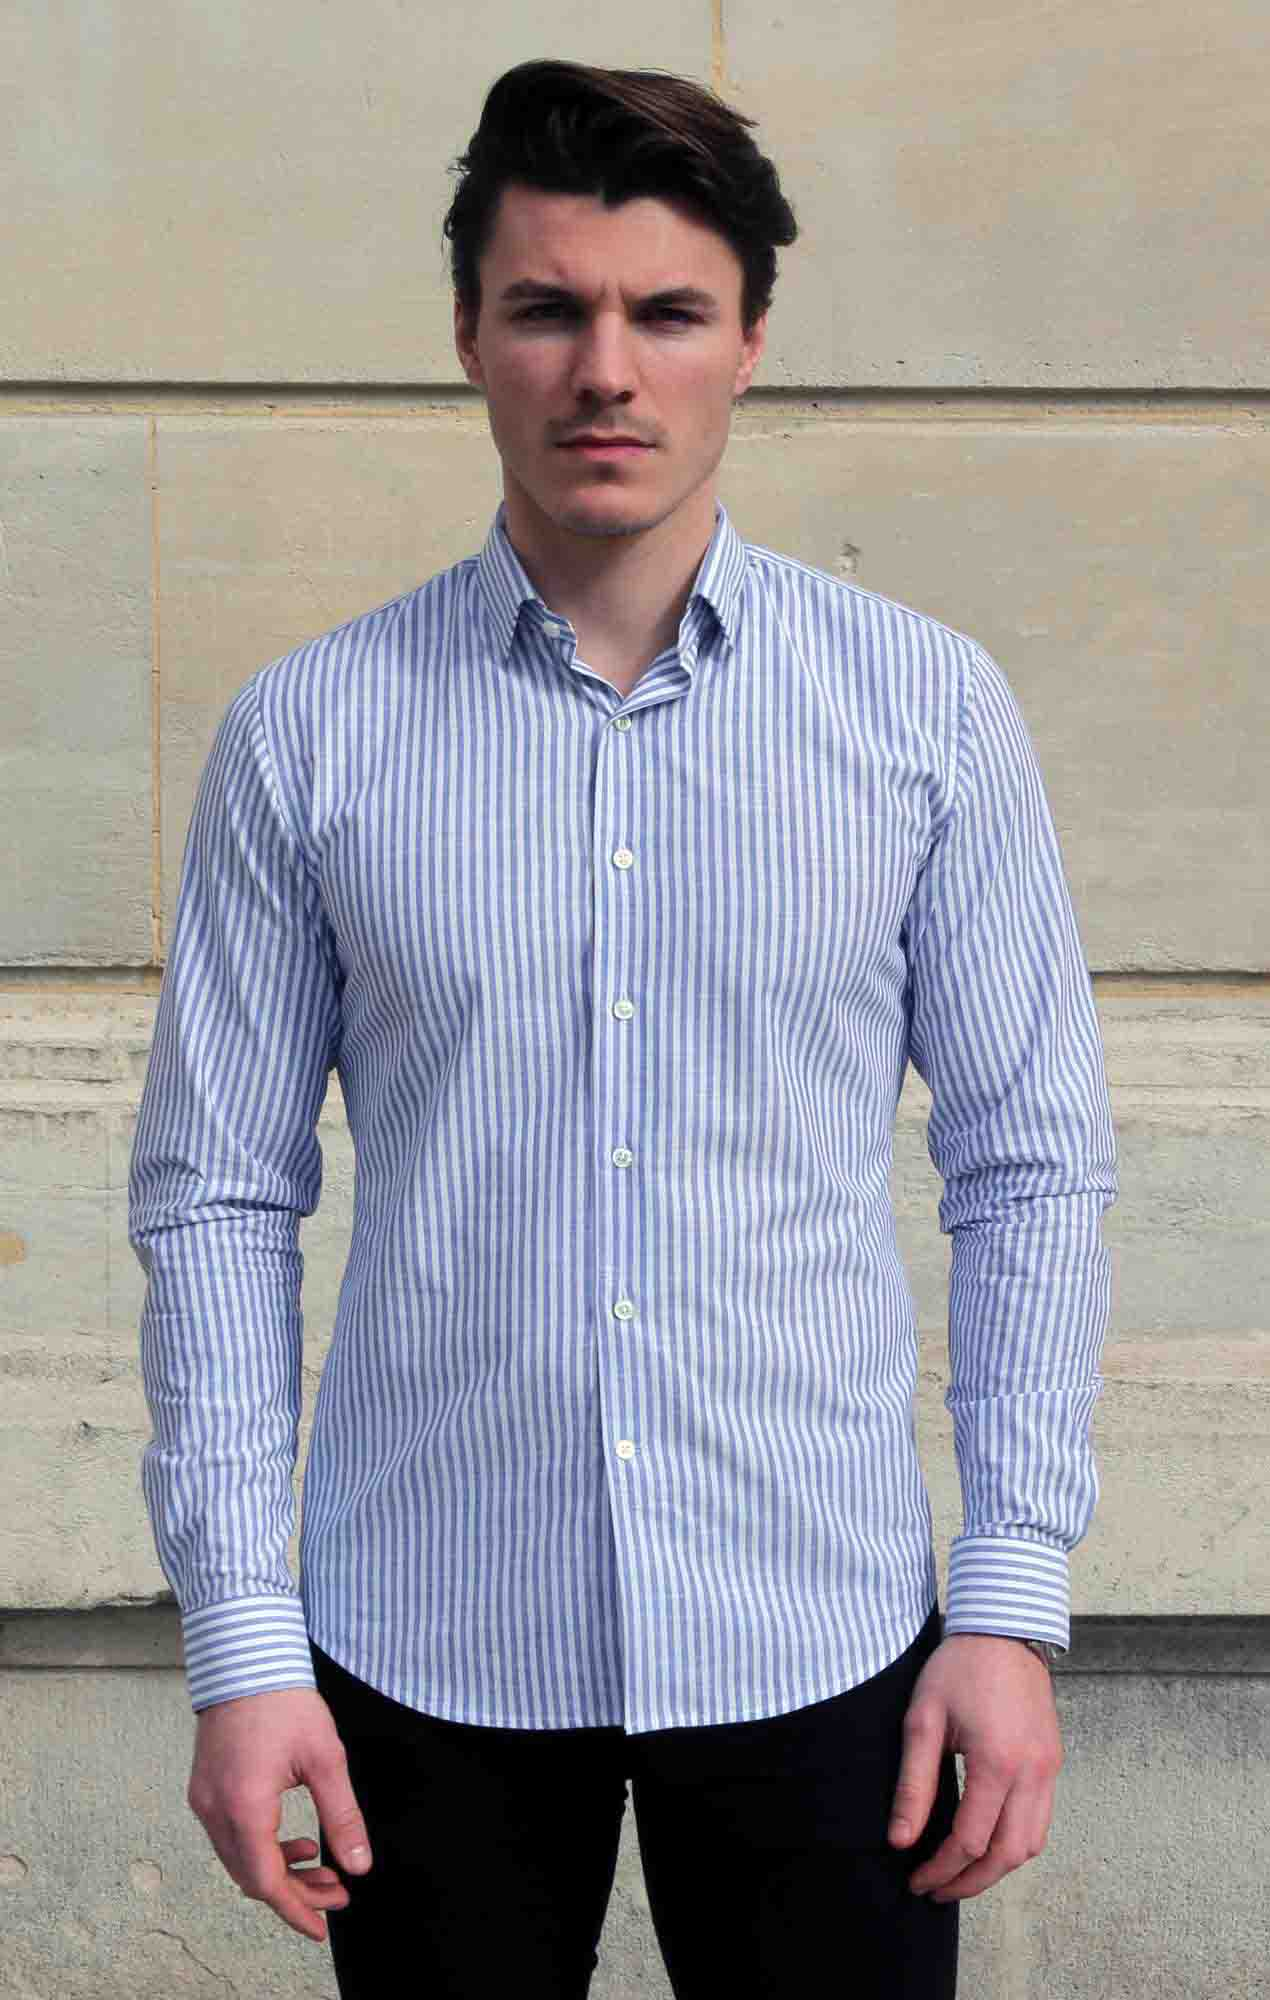 Chemise chambray rayures equidistantes Chemises Hommes